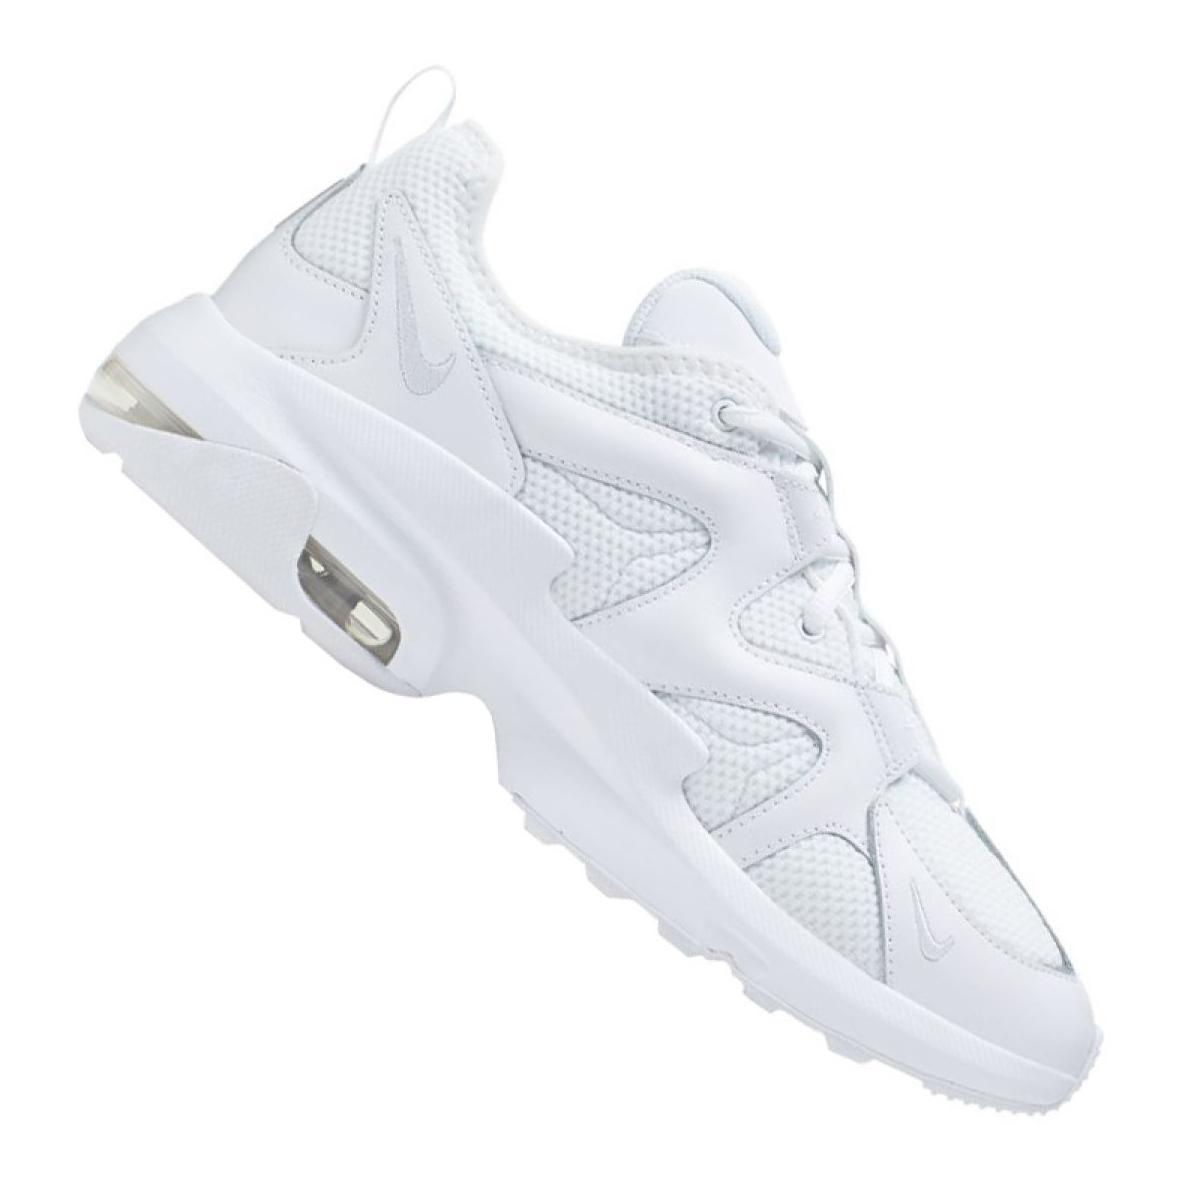 Nike Air Max Graviton M AT4525-102 shoes white - KeeShoes